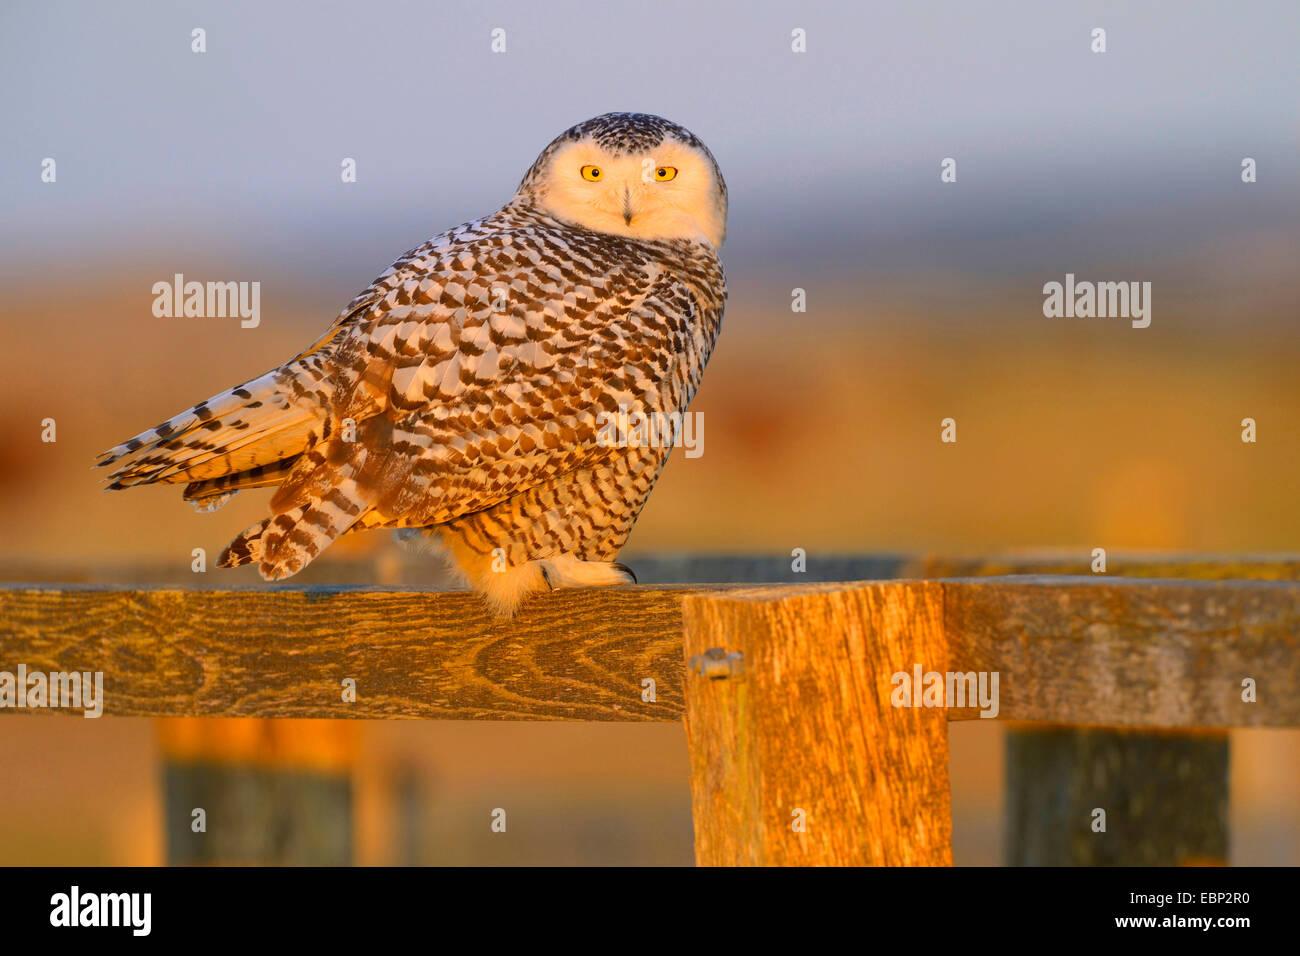 Snowy Owl (Strix scandiaca, Nyctea scandiaca, Bubo scandiacus), female resting on a wooden fence in evening light, Stock Photo